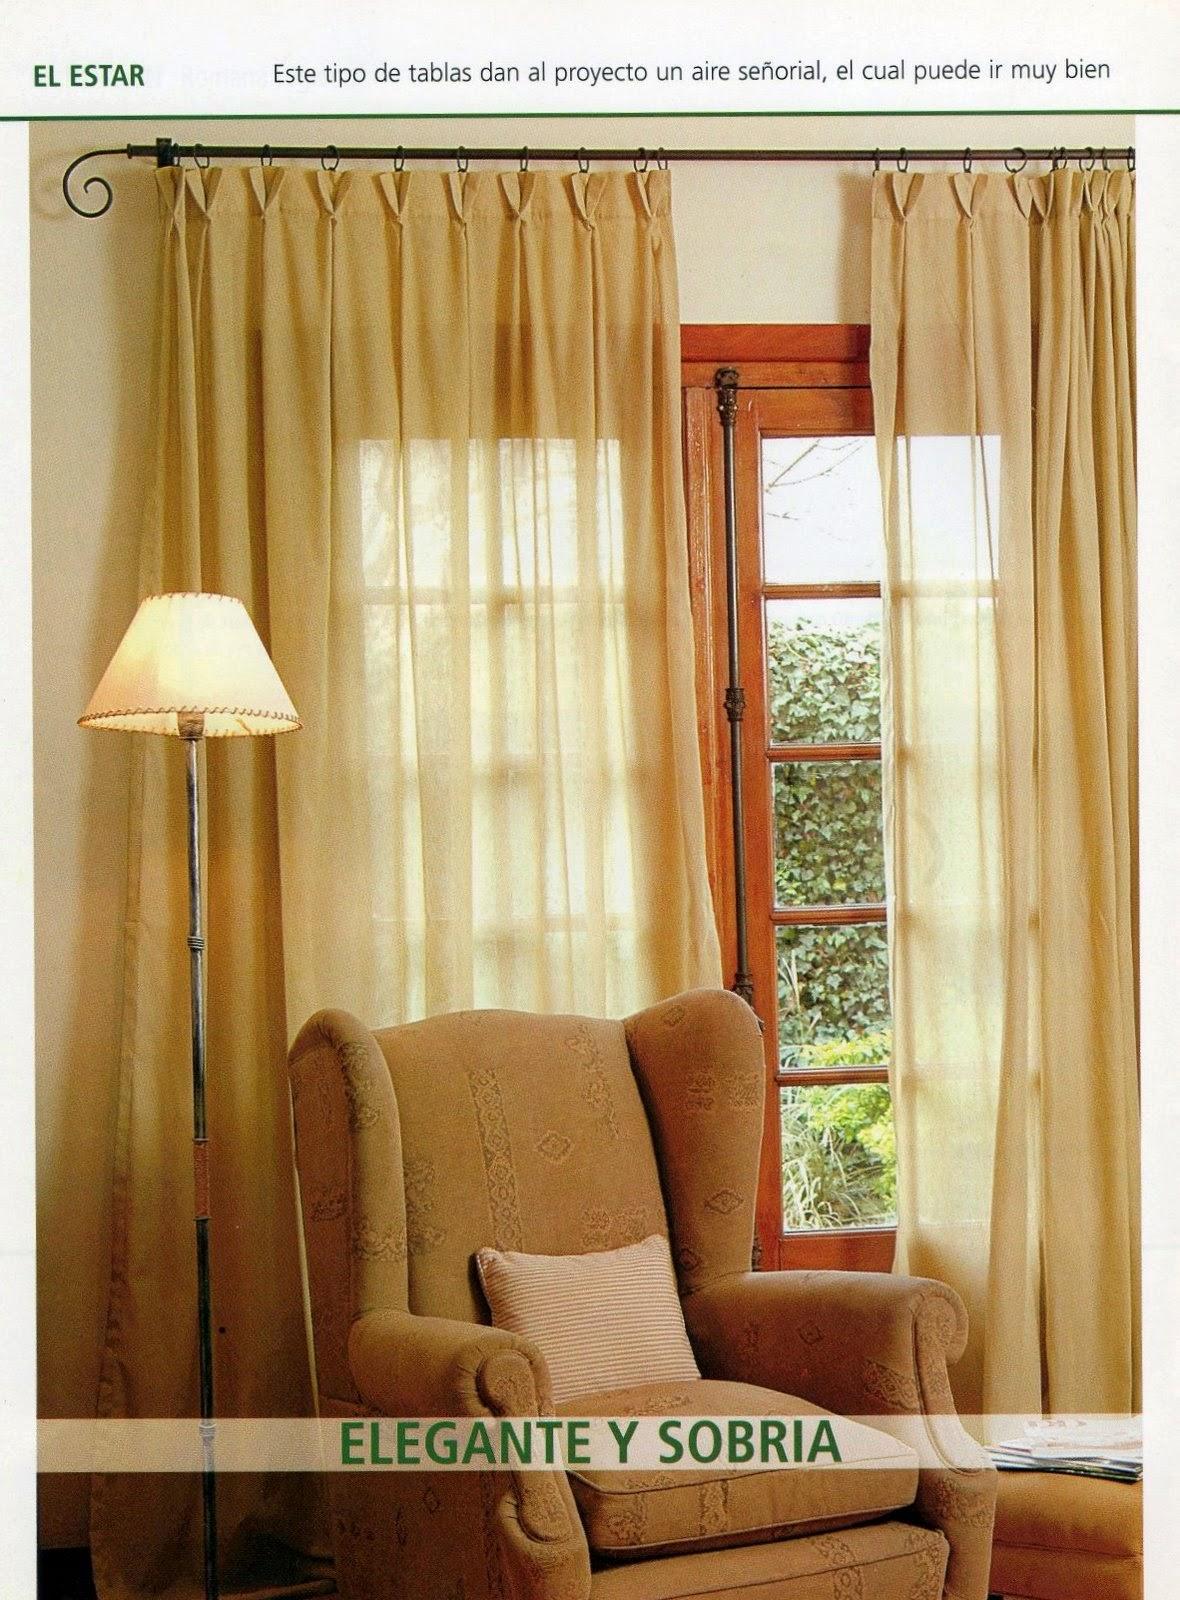 Como hacer cortinas paso a paso revistas de manualidades for Paginas de decoracion de interiores gratis